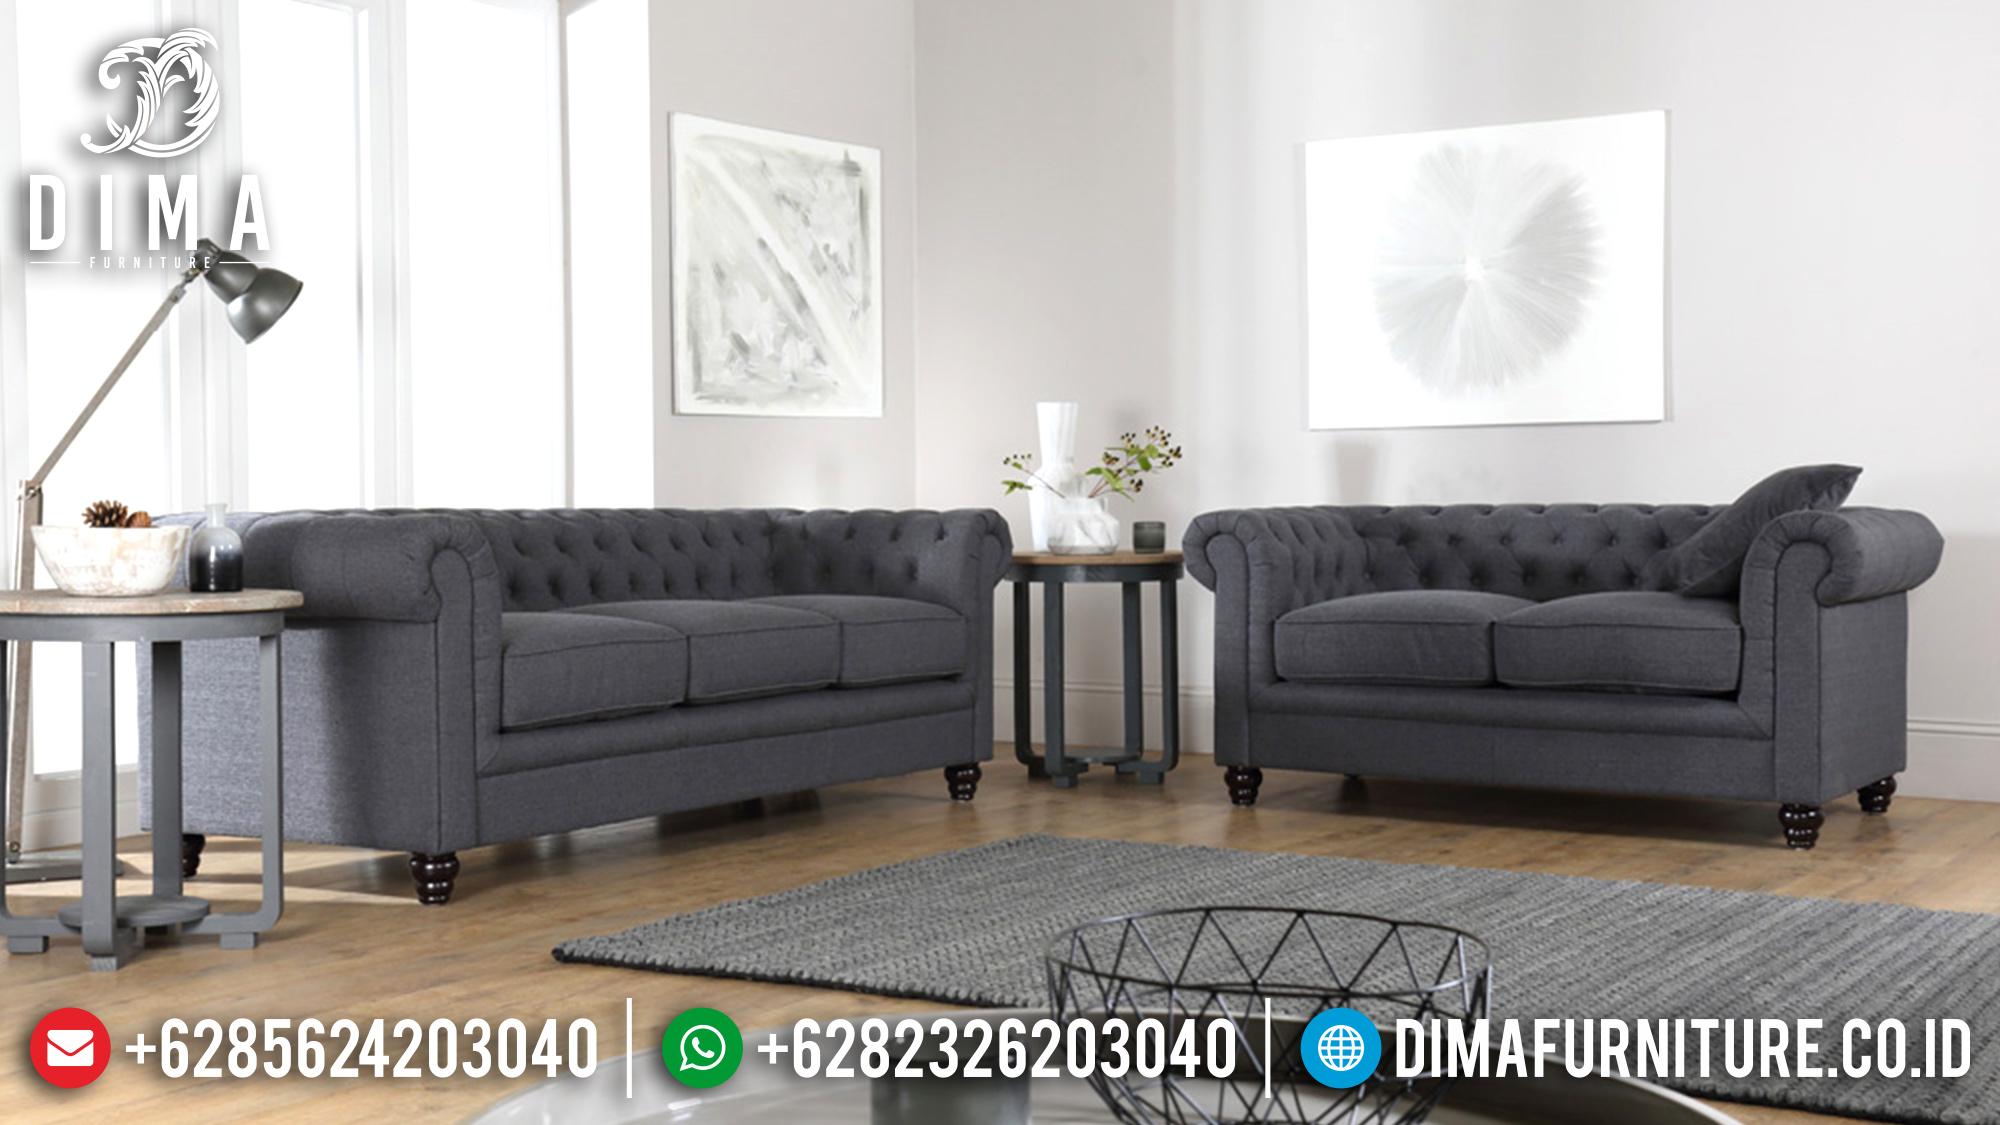 Set Sofa Tamu Minimalis Mewah Jepara Fabric Canvas Terbaru 2018 ST-0525